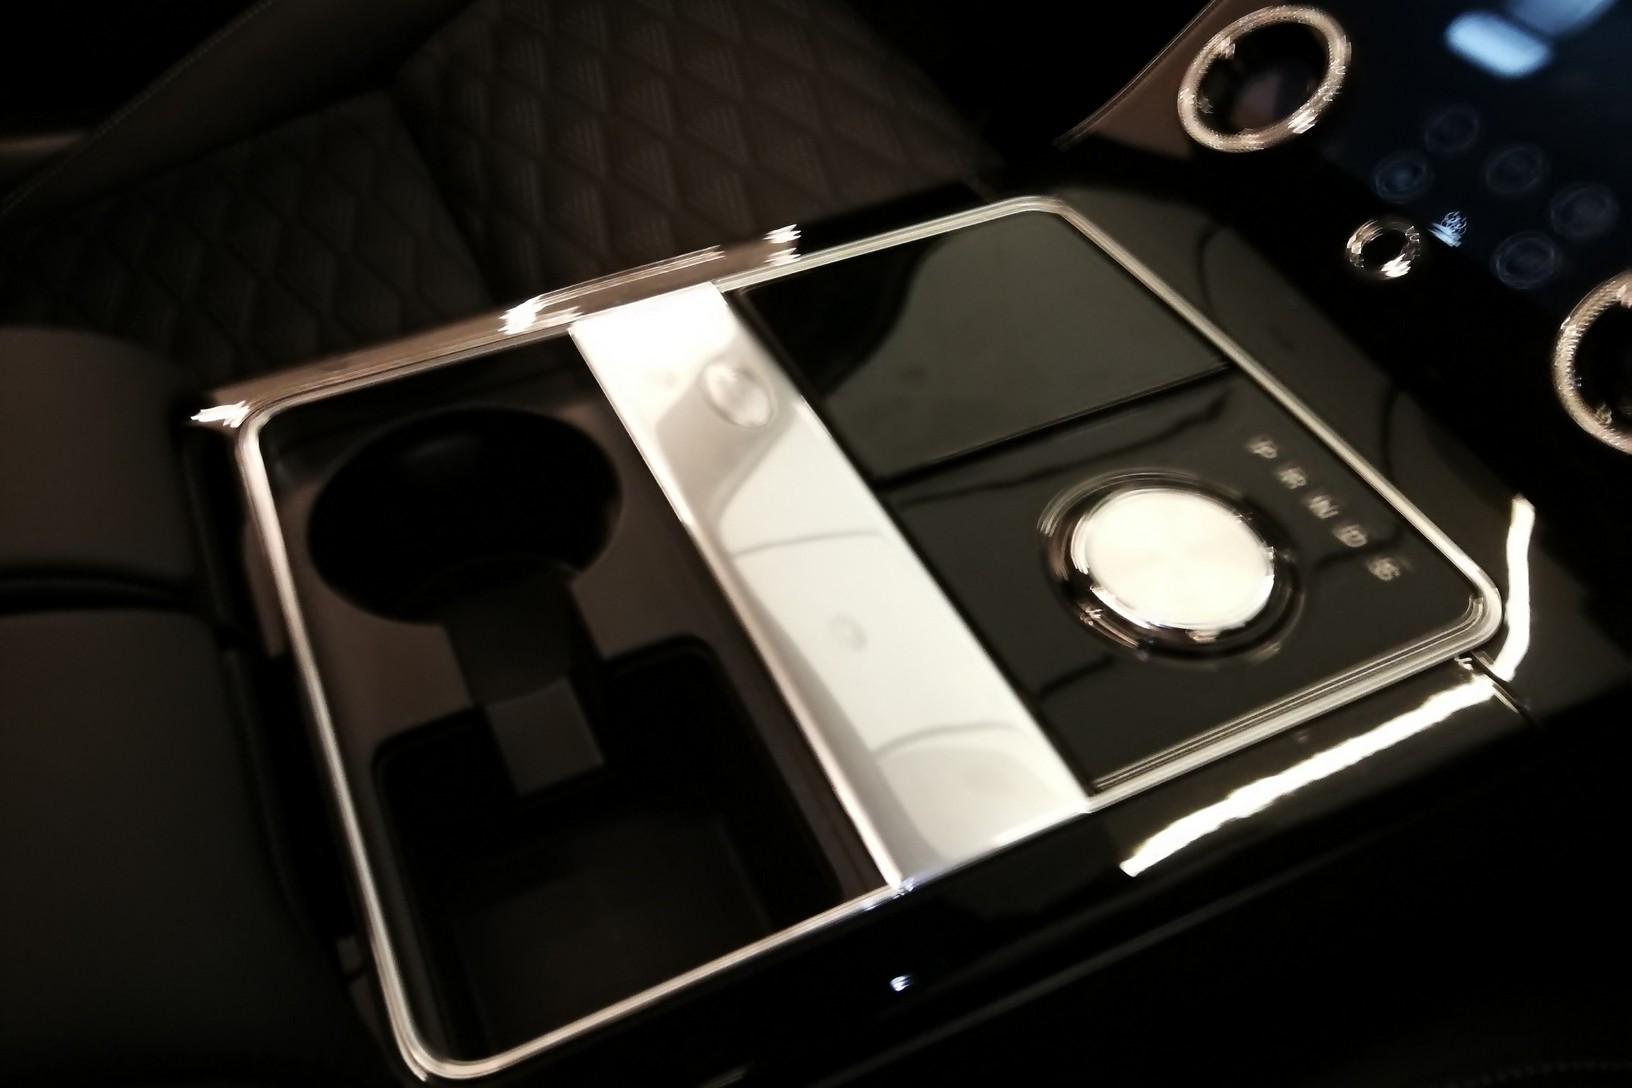 Land Rover Range Rover Velar 5.0 P550 SVAutobiography Dynamic Edition image 13